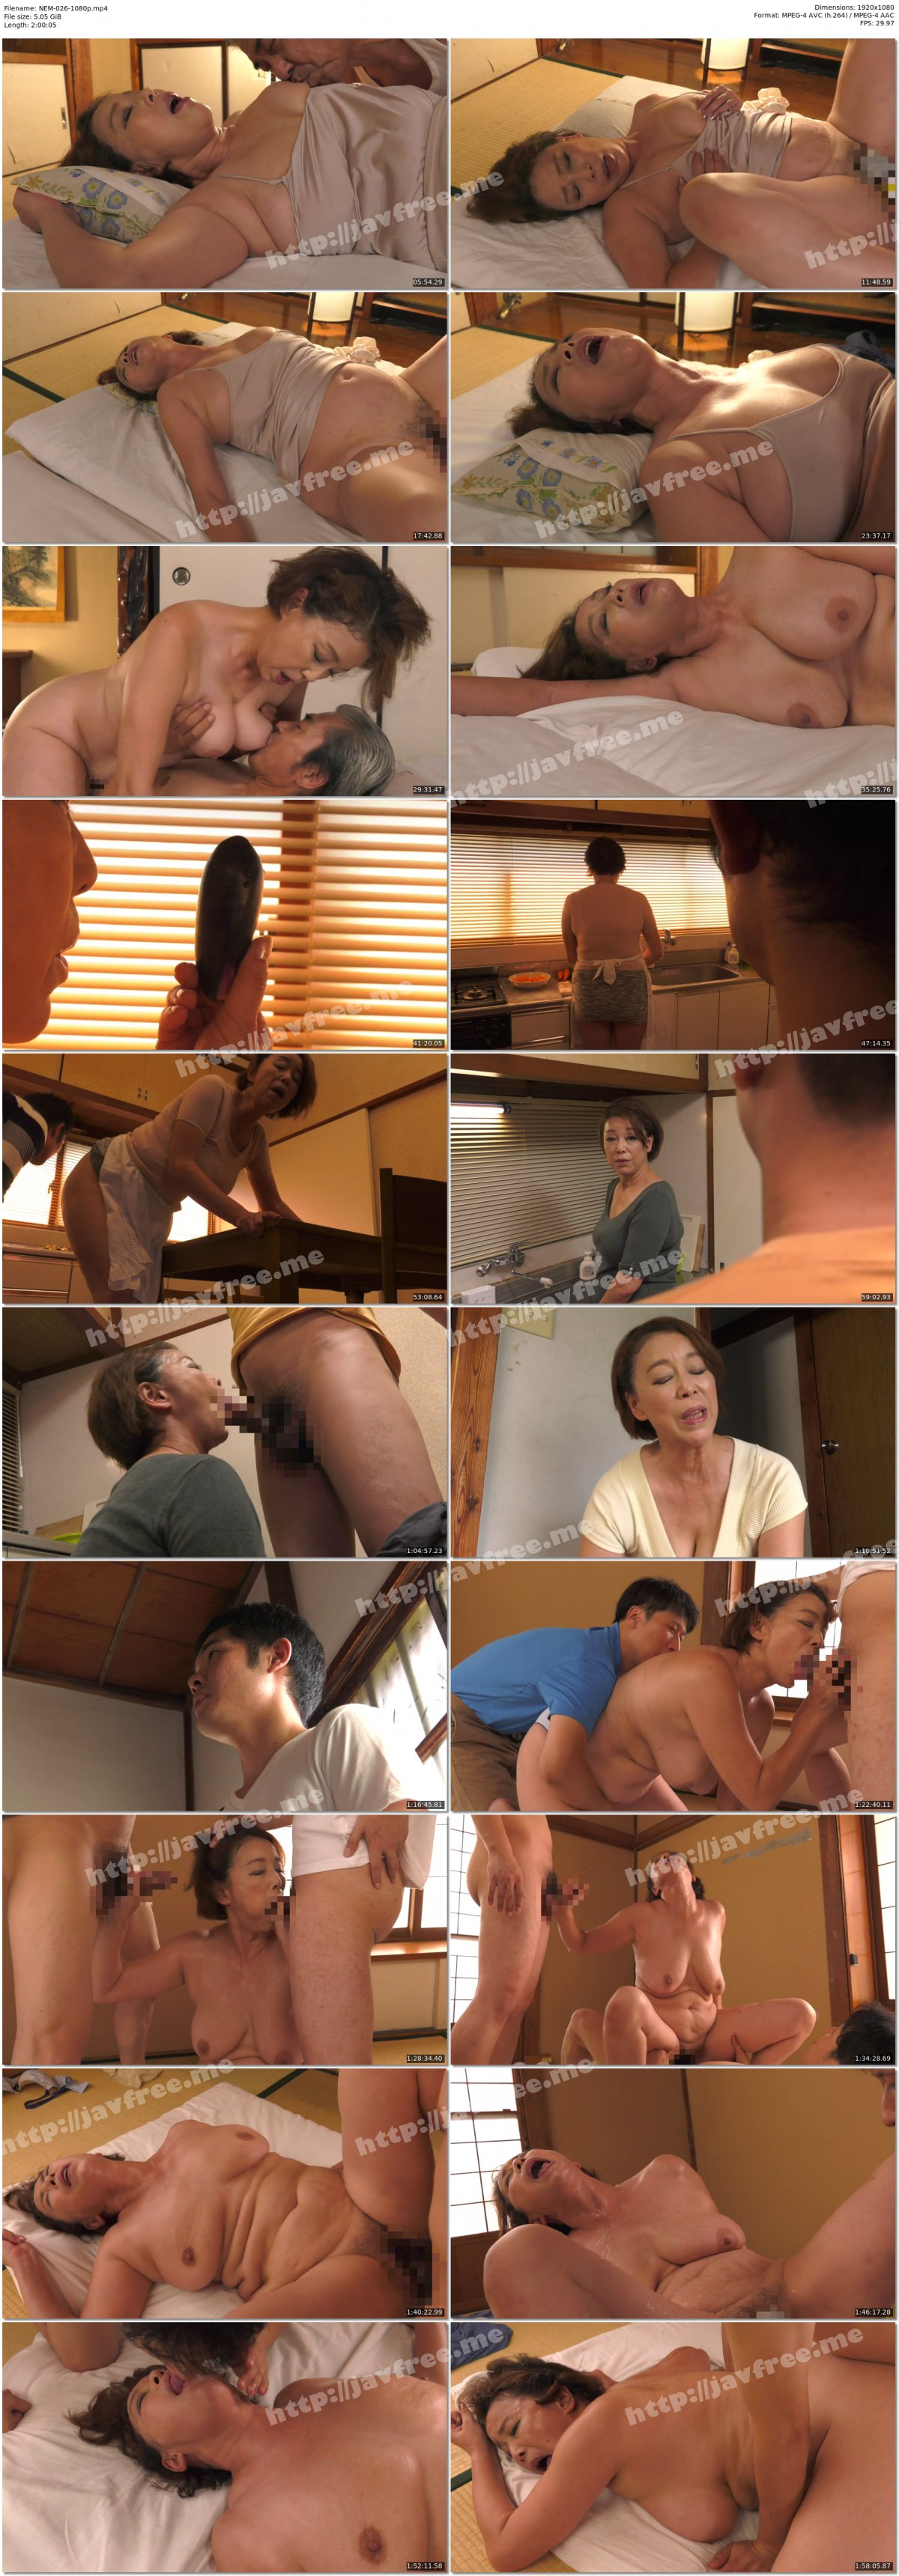 [HD][NEM-026] 真・異常性交 五十路母と子 其ノ拾壱 二人の息子に求められた熟母 青井マリ